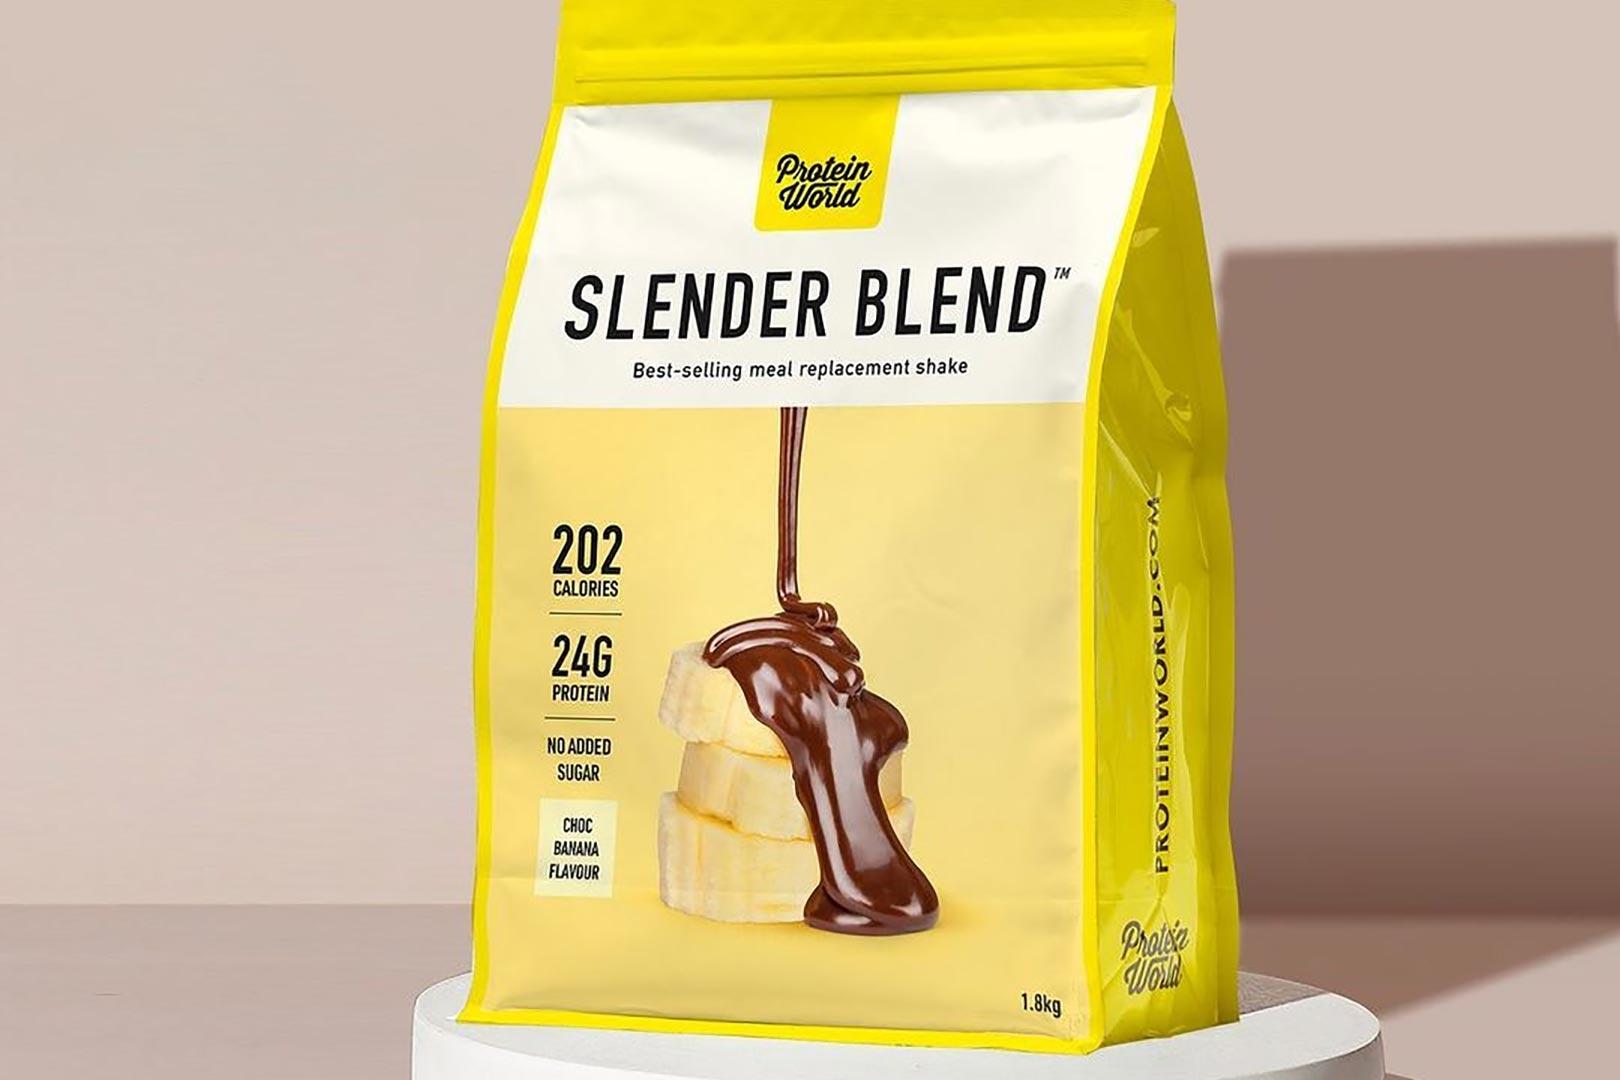 protein world choc banana slender blend